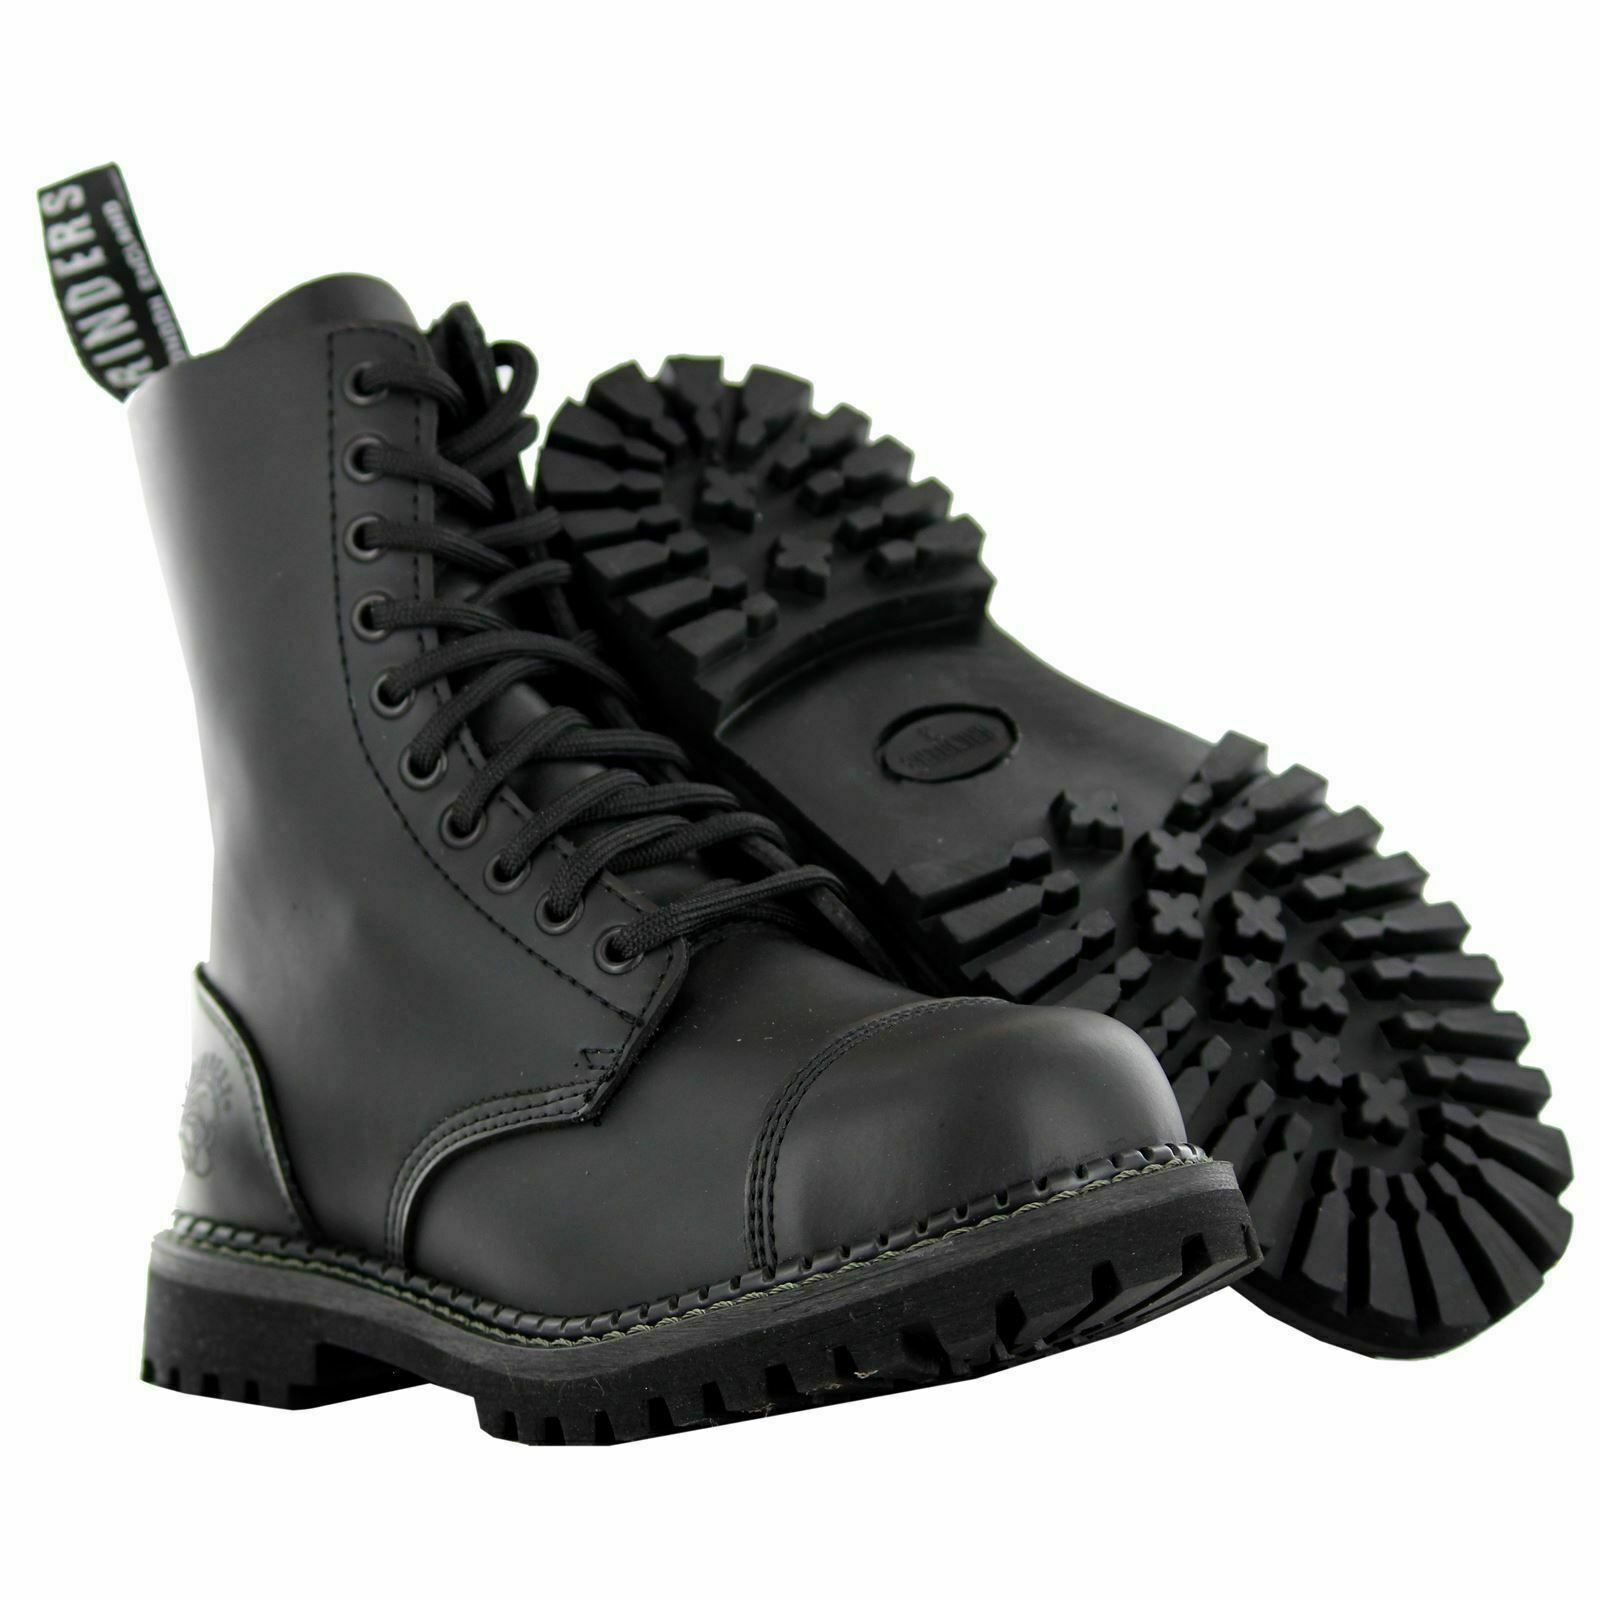 Men's Women's Grinders Stag Black Lace Up Leather Combat Uniform Boots New